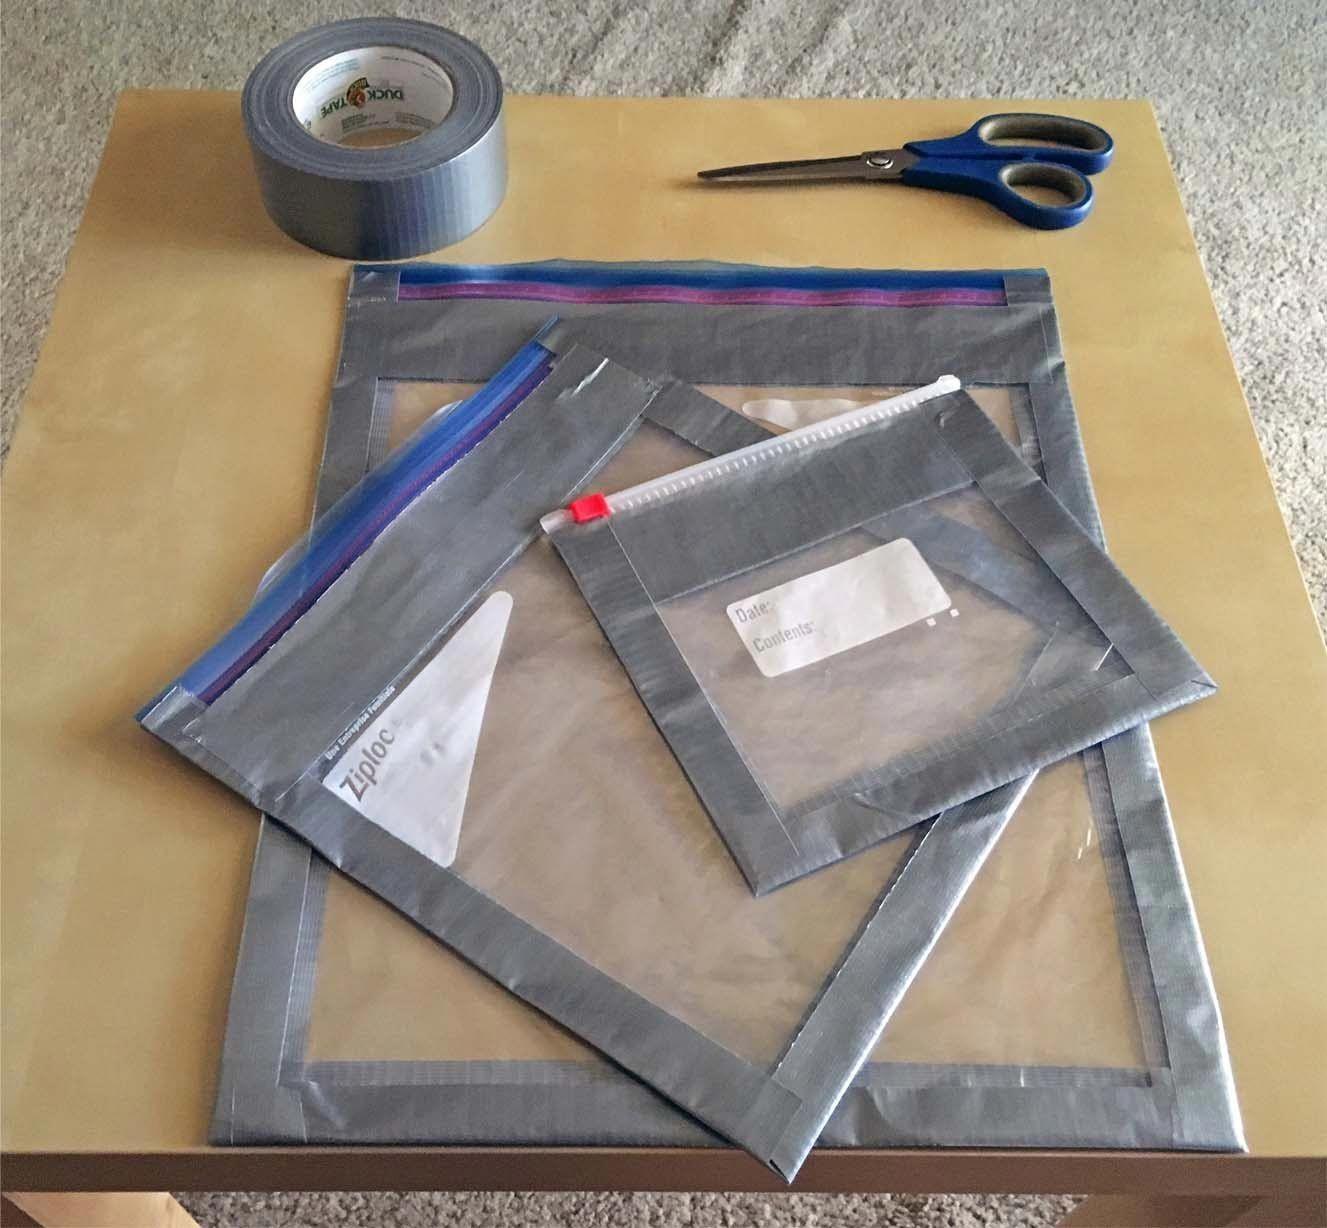 DIY Ziploc Reinforced Packing Cube For Ultralight